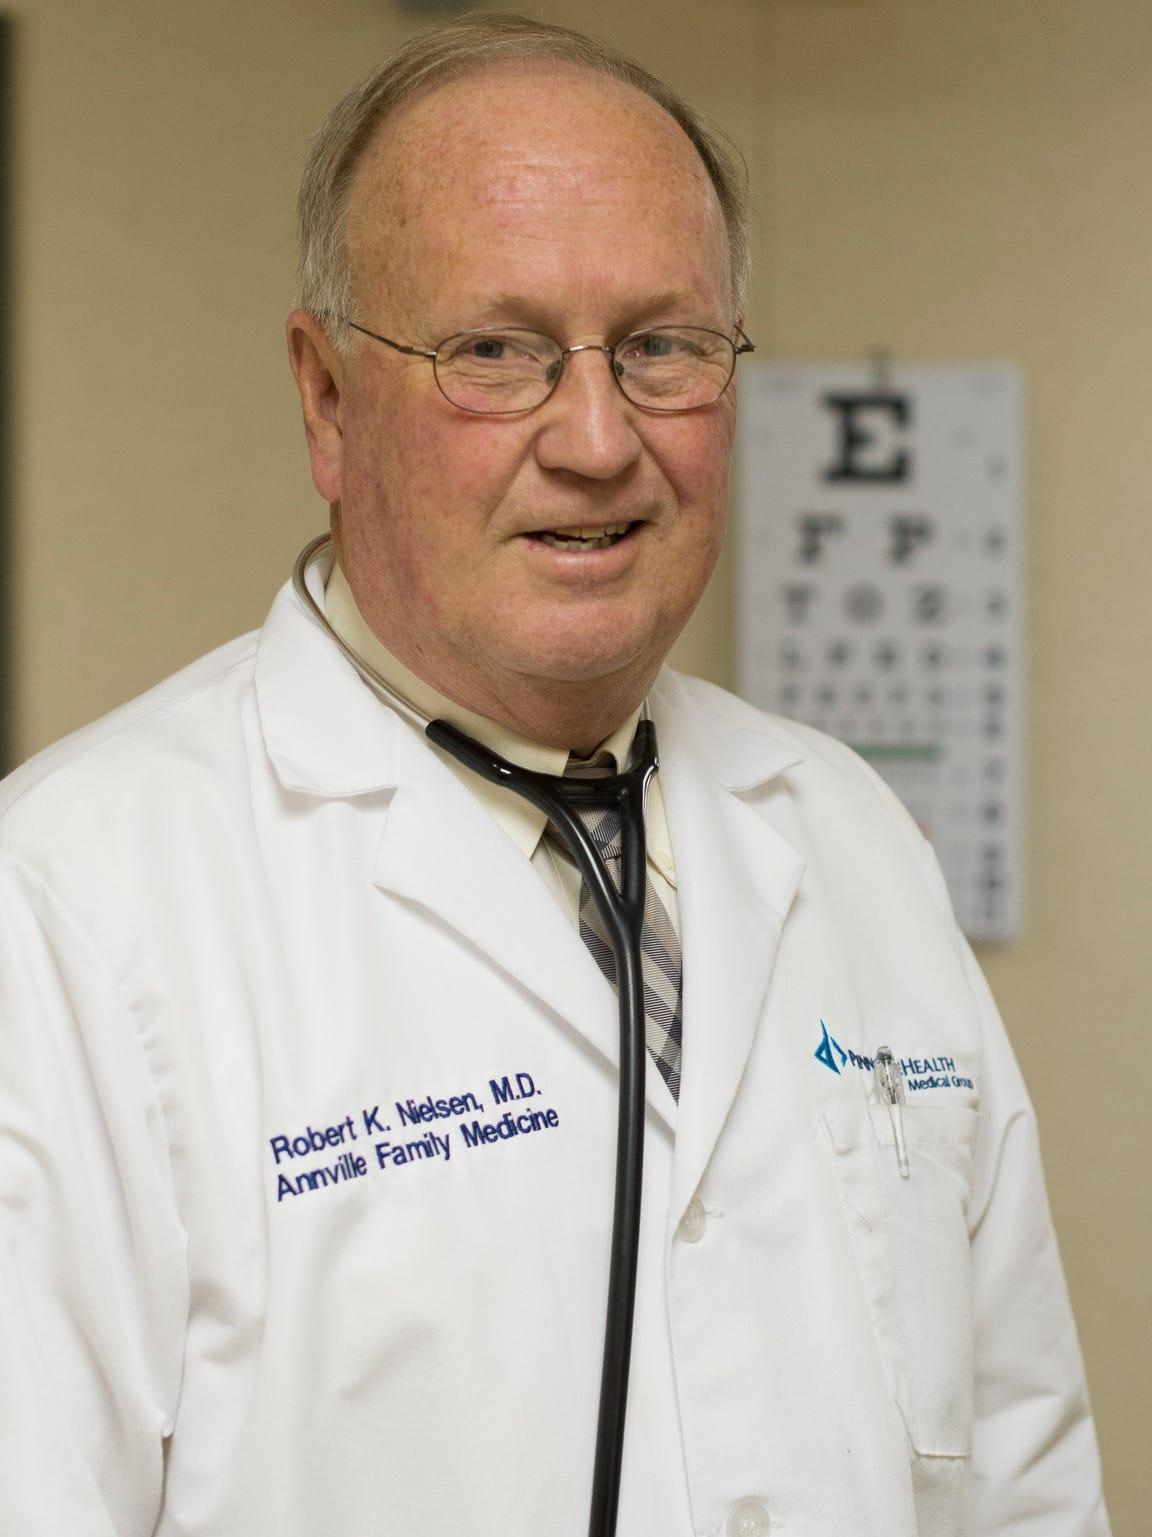 Dr. Robert Nielsen, a founding partner in Annville